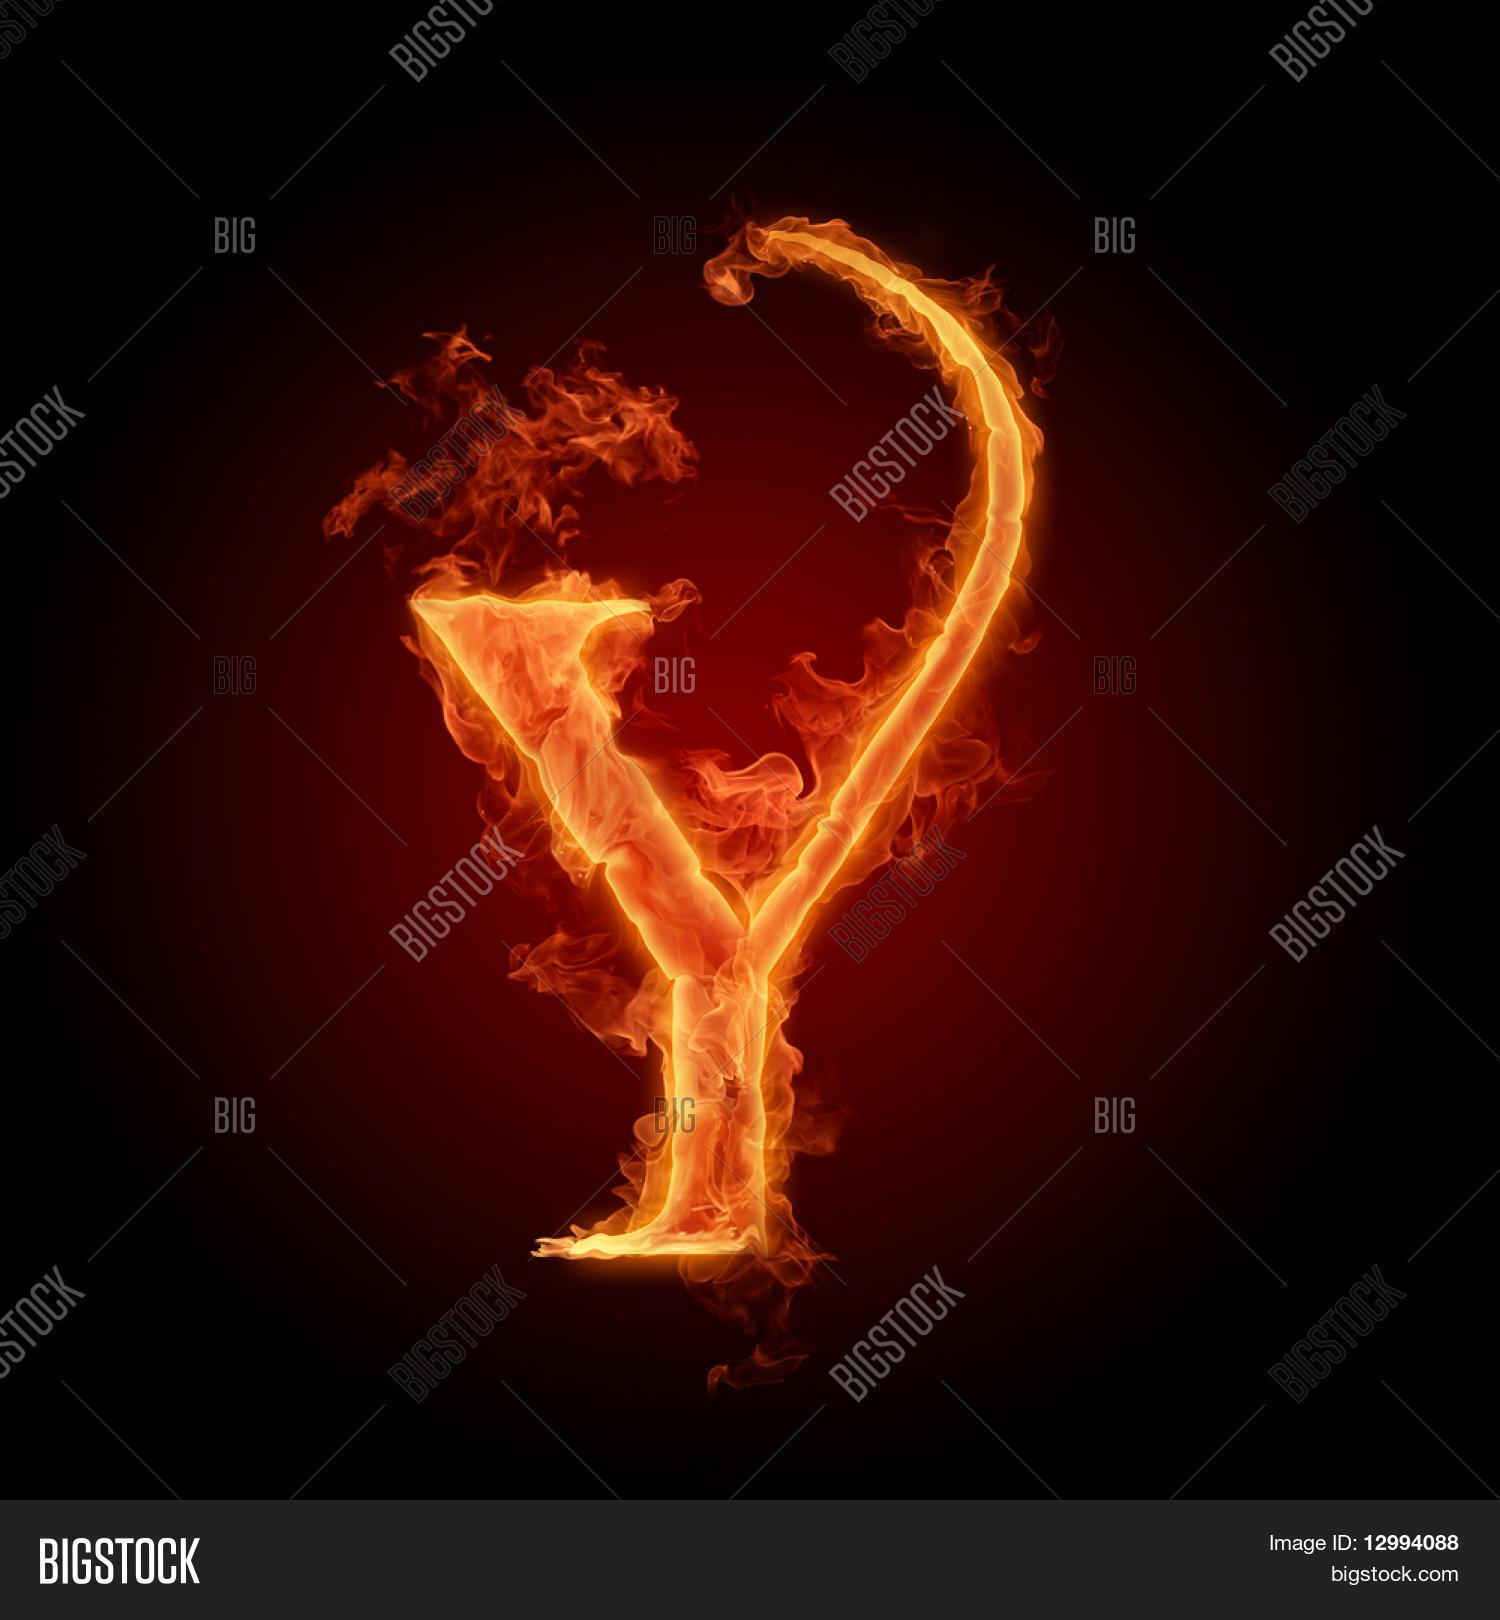 Fiery Font Letter Y Image Photo Free Trial Bigstock